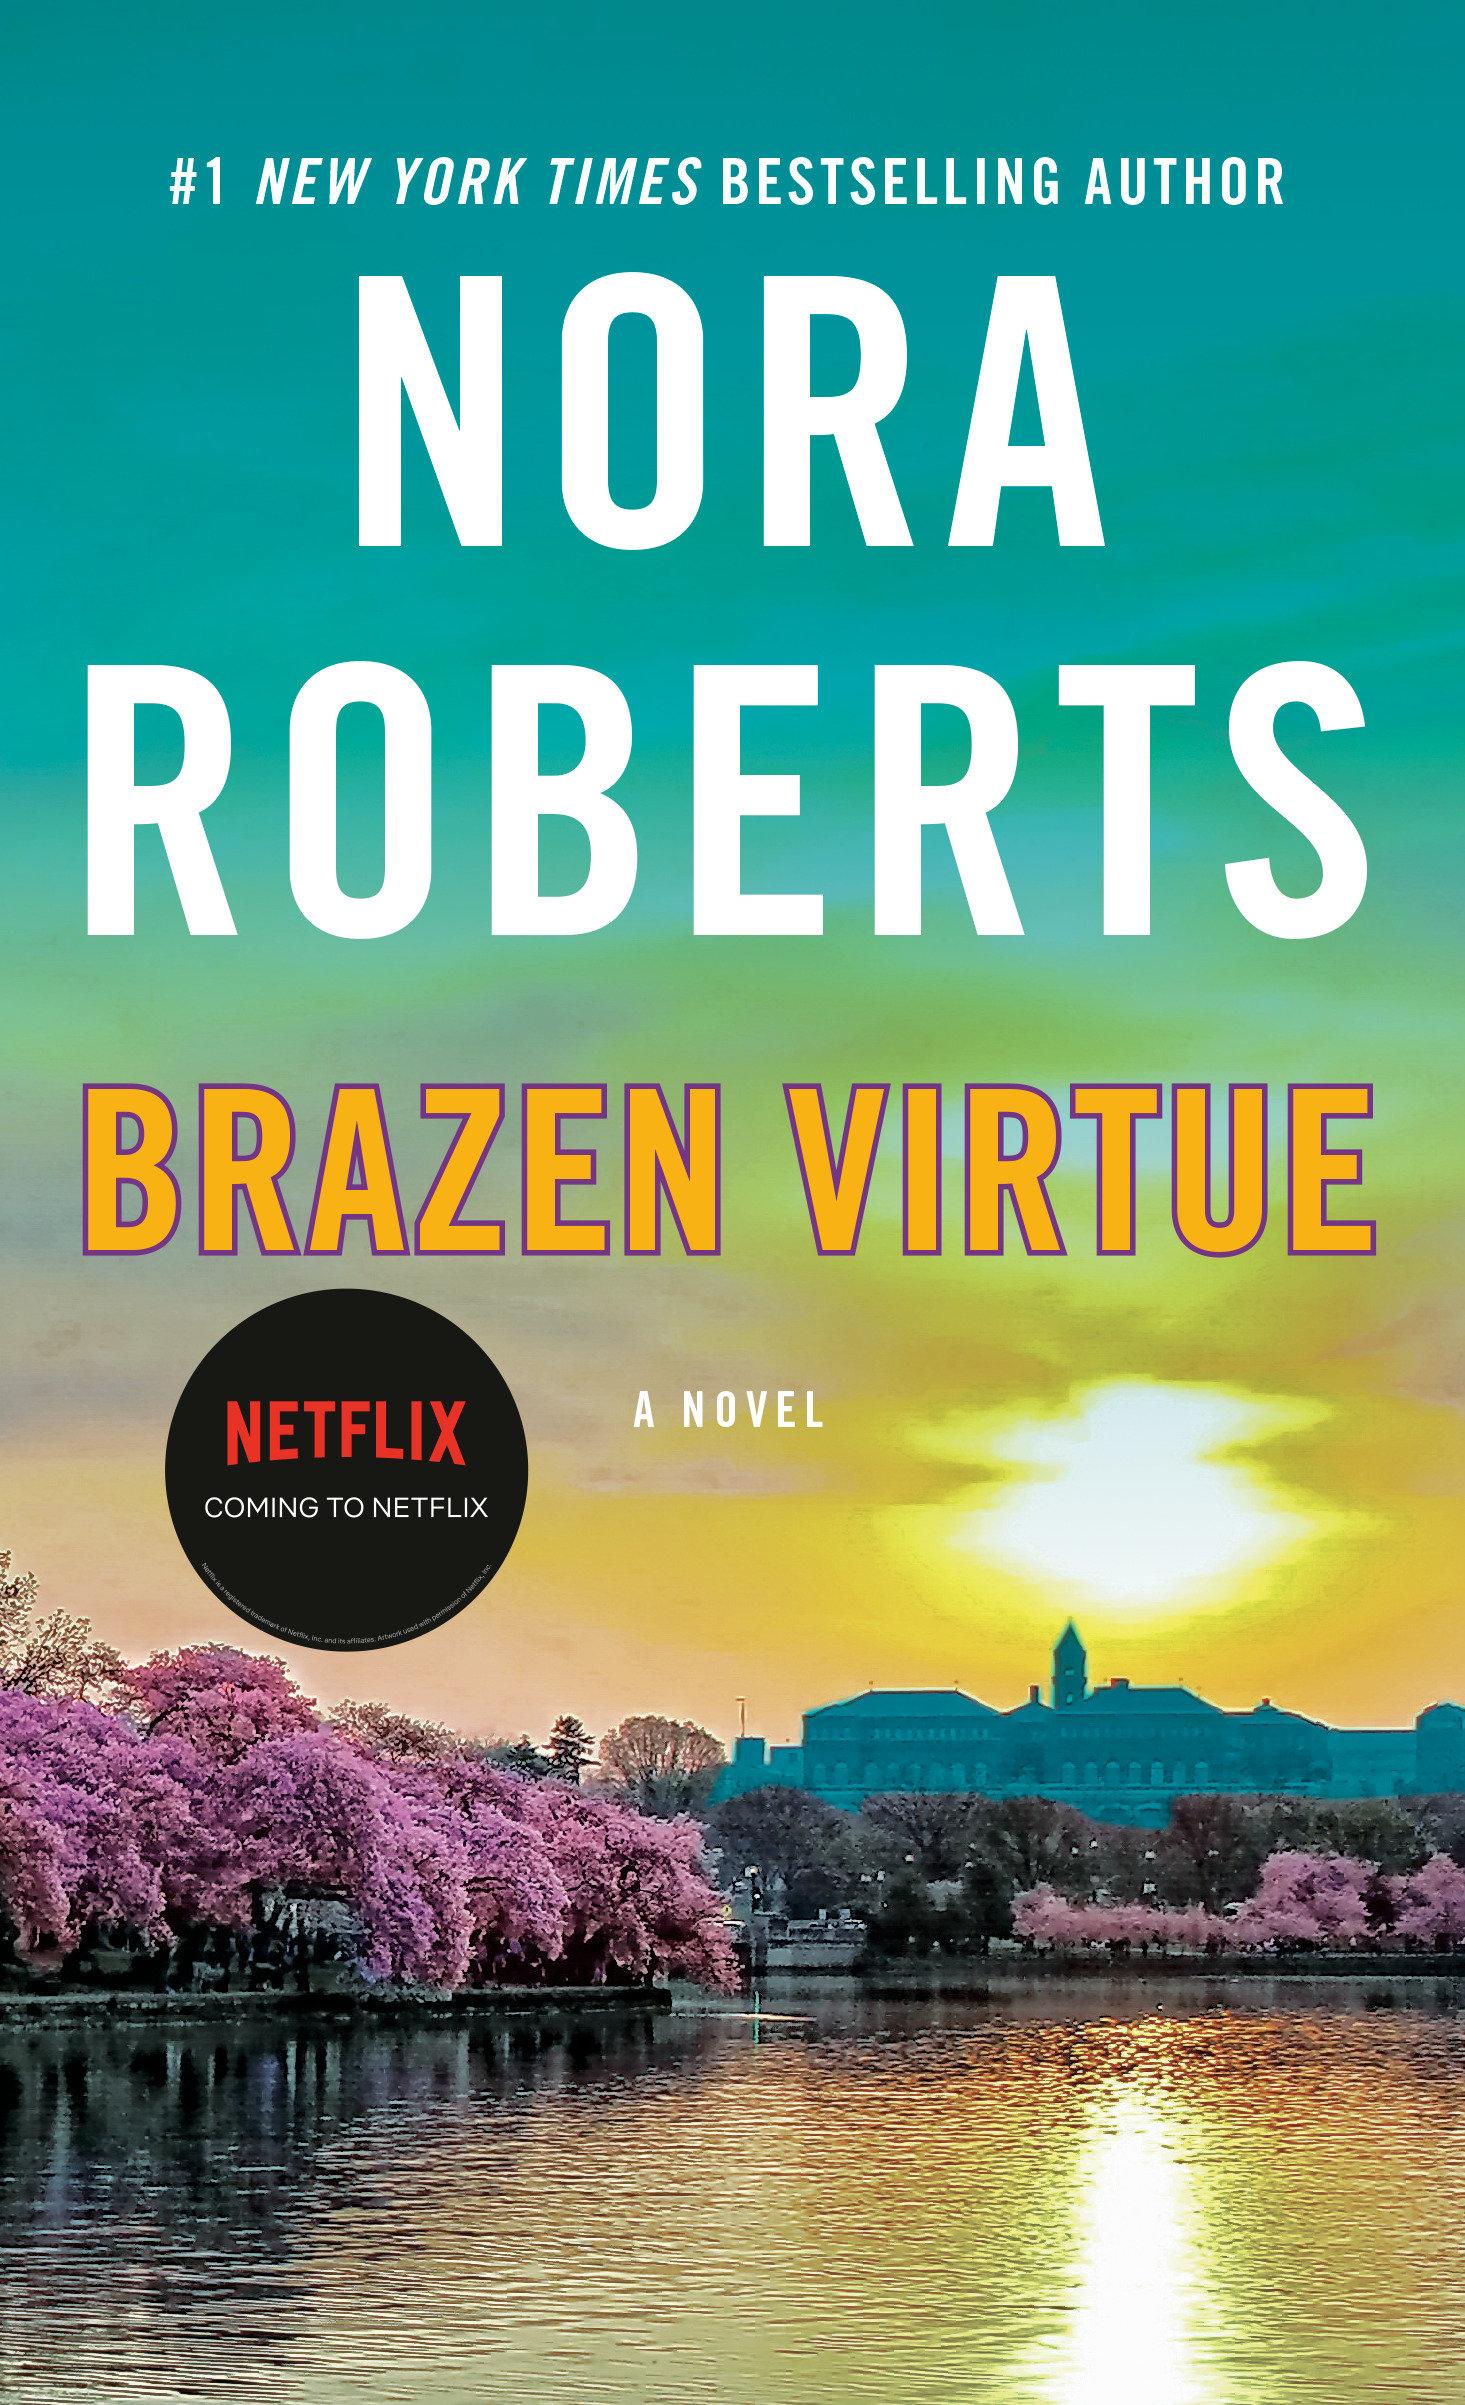 Brazen virtue cover image